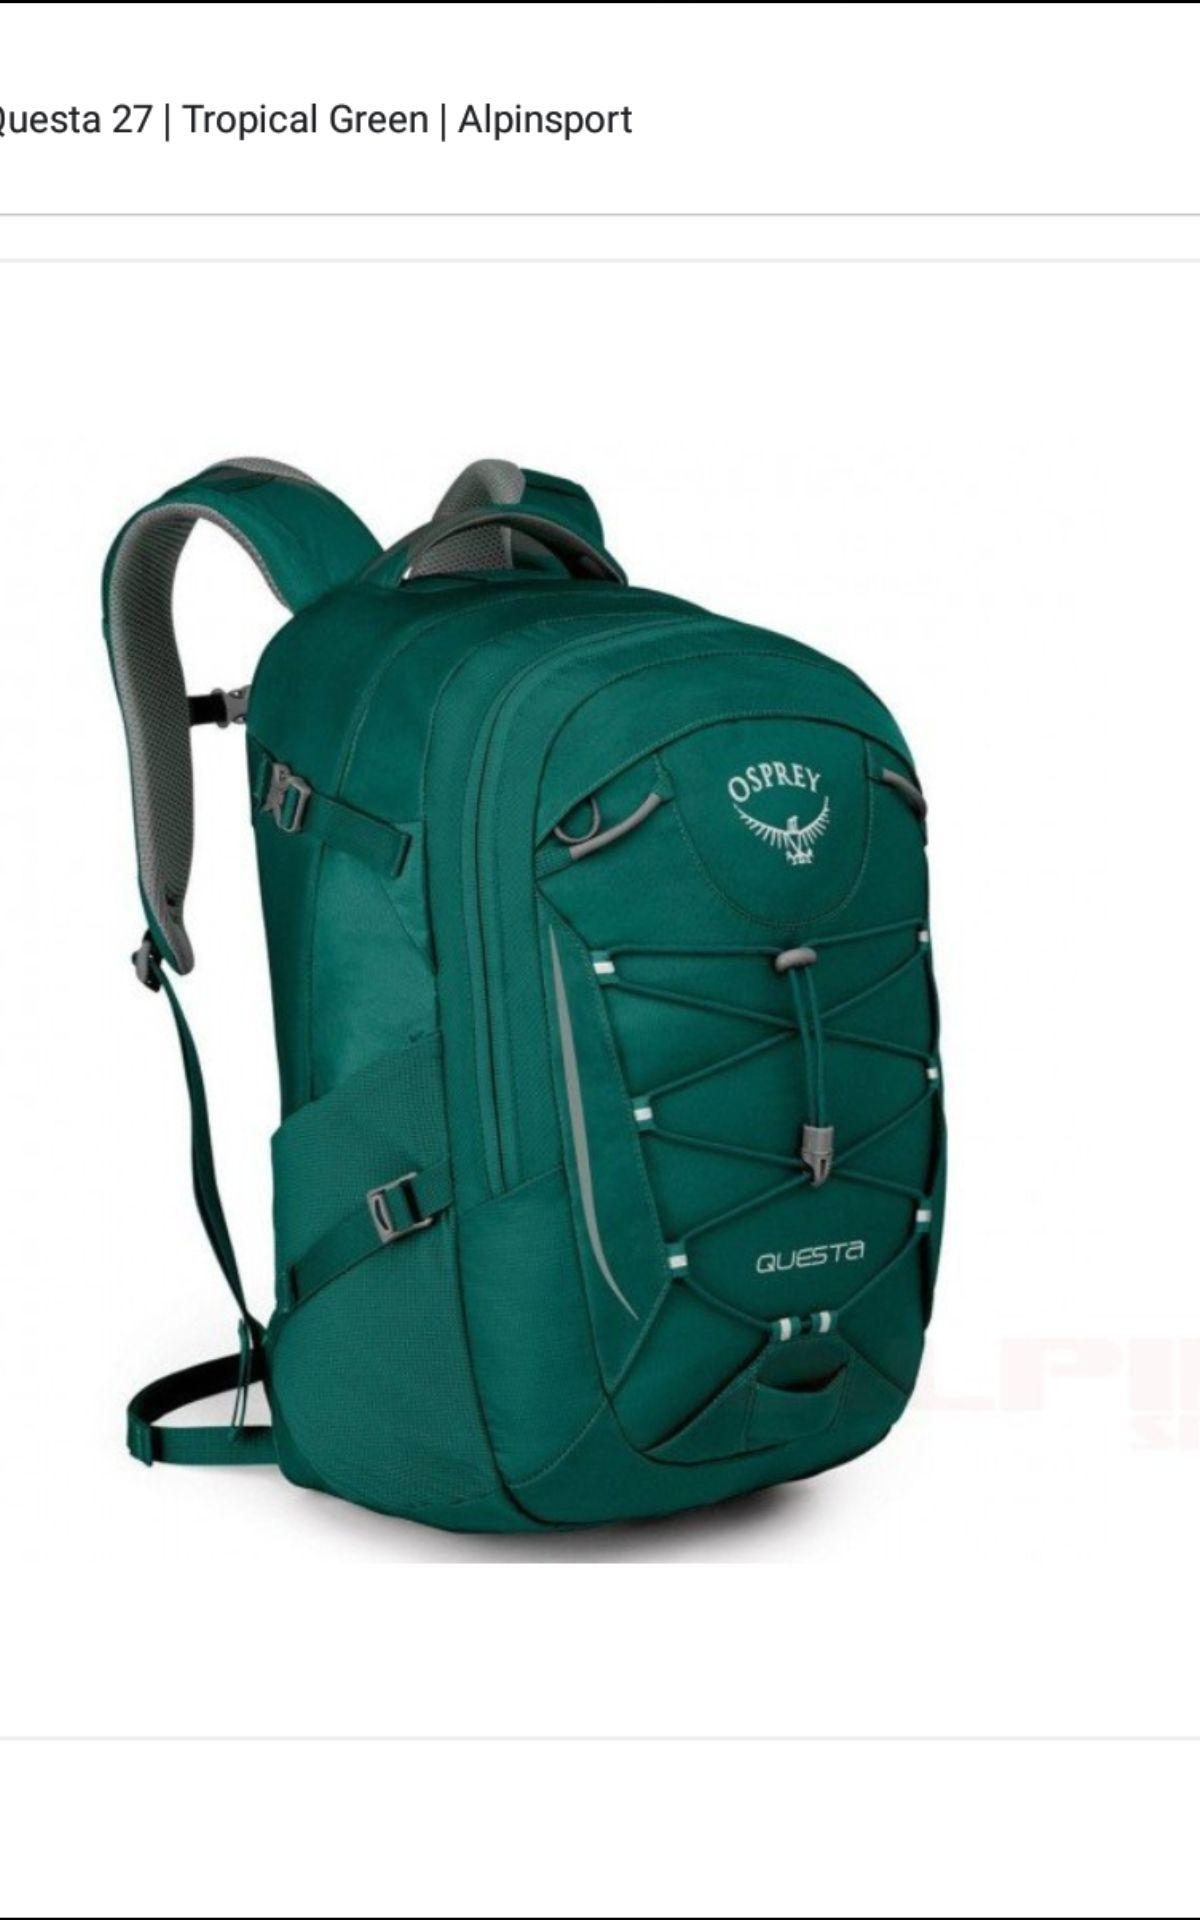 Plecak Osprey Questa 27L